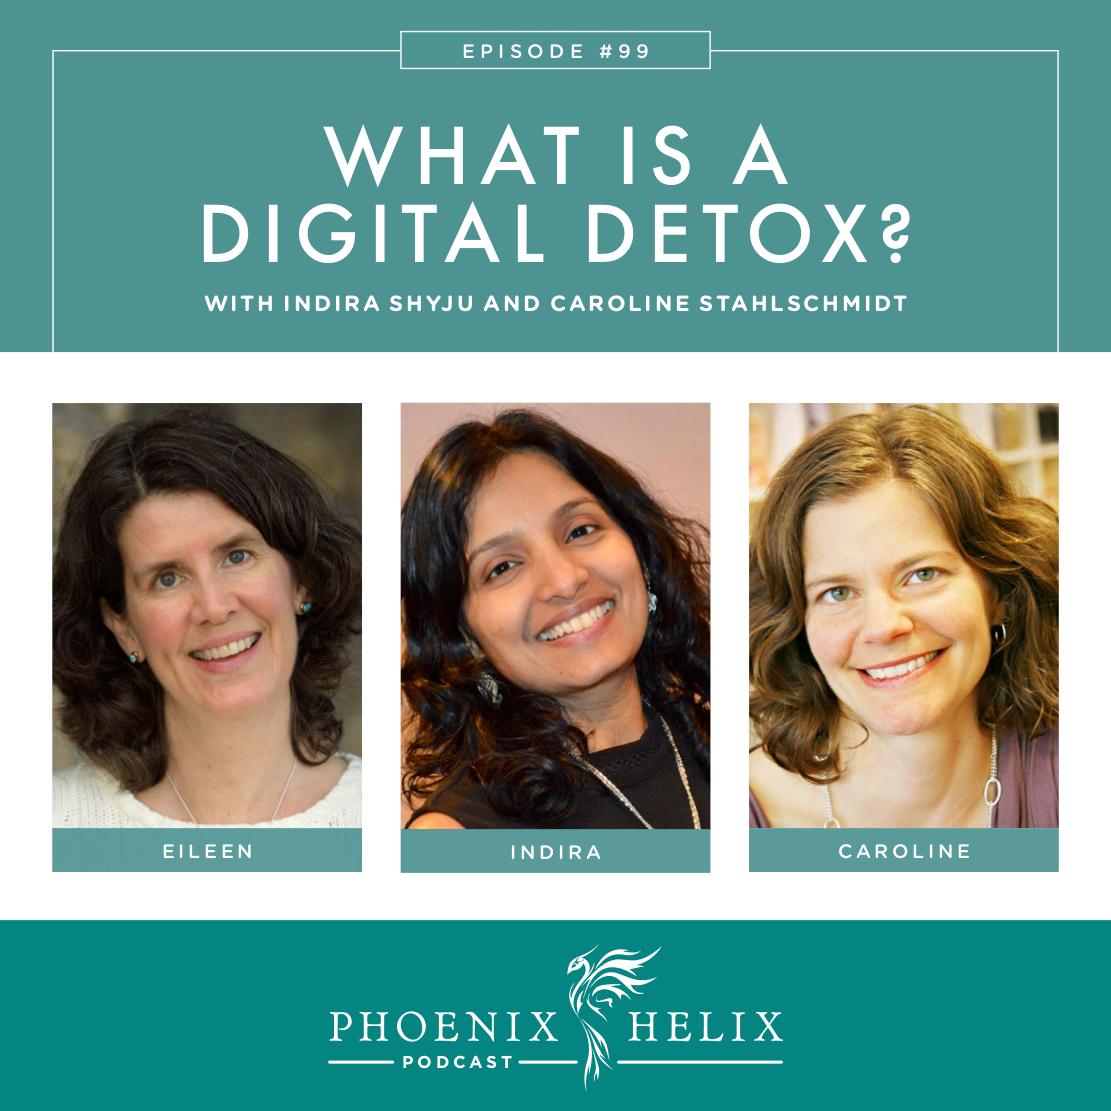 What Is a Digital Detox? | Phoenix Helix Podcast